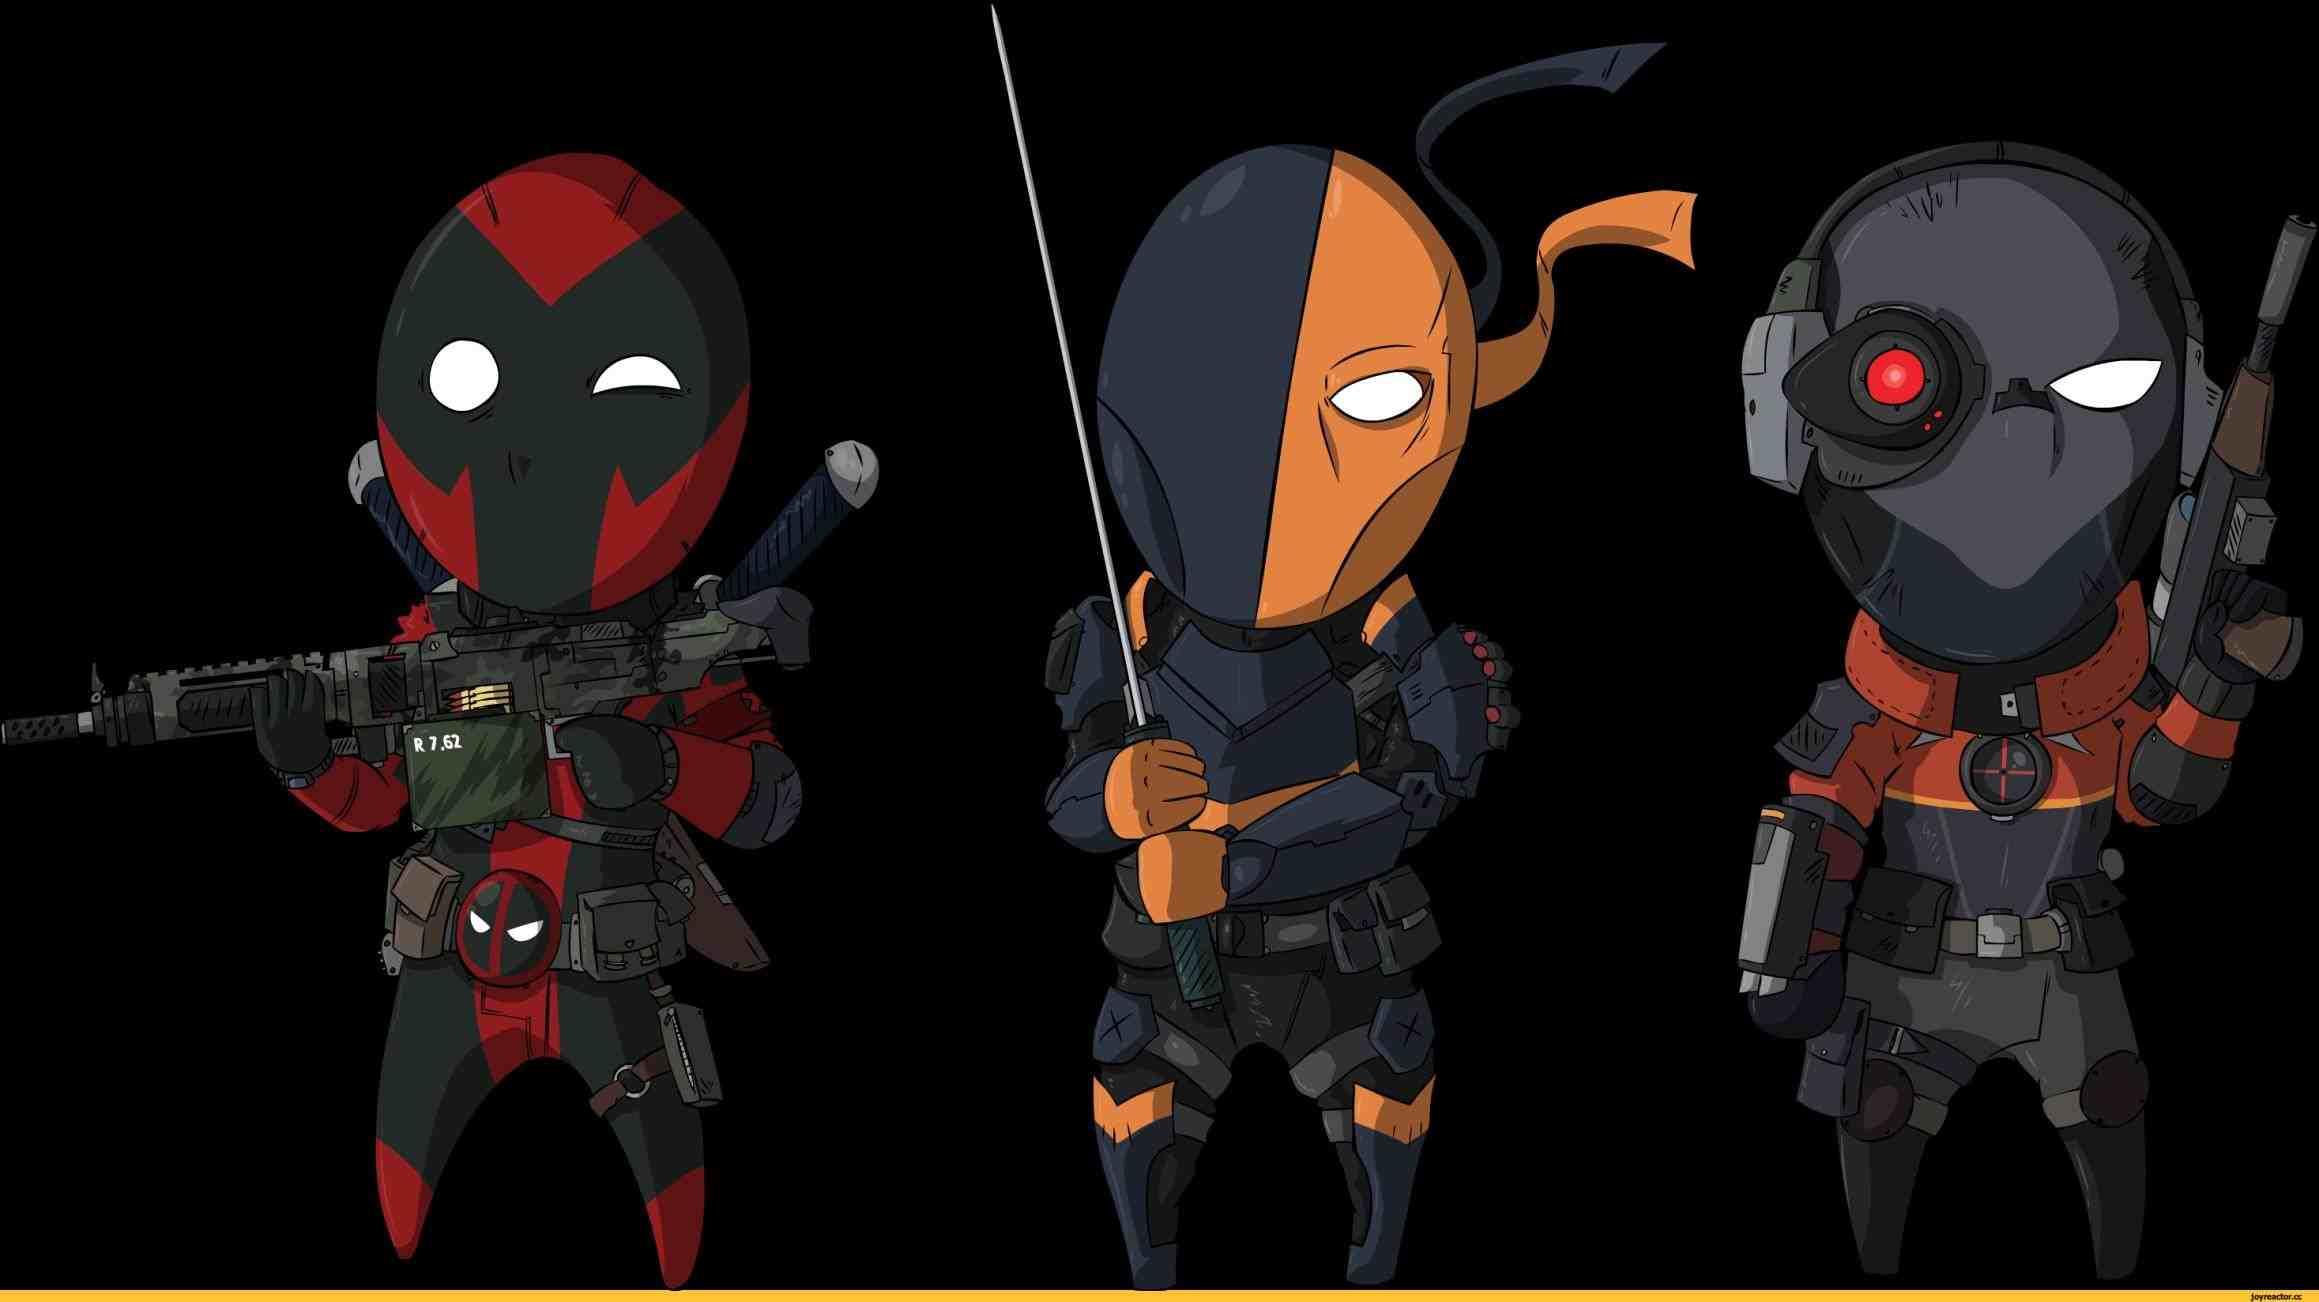 Deathstroke Vs Deadpool Vs Deadshot